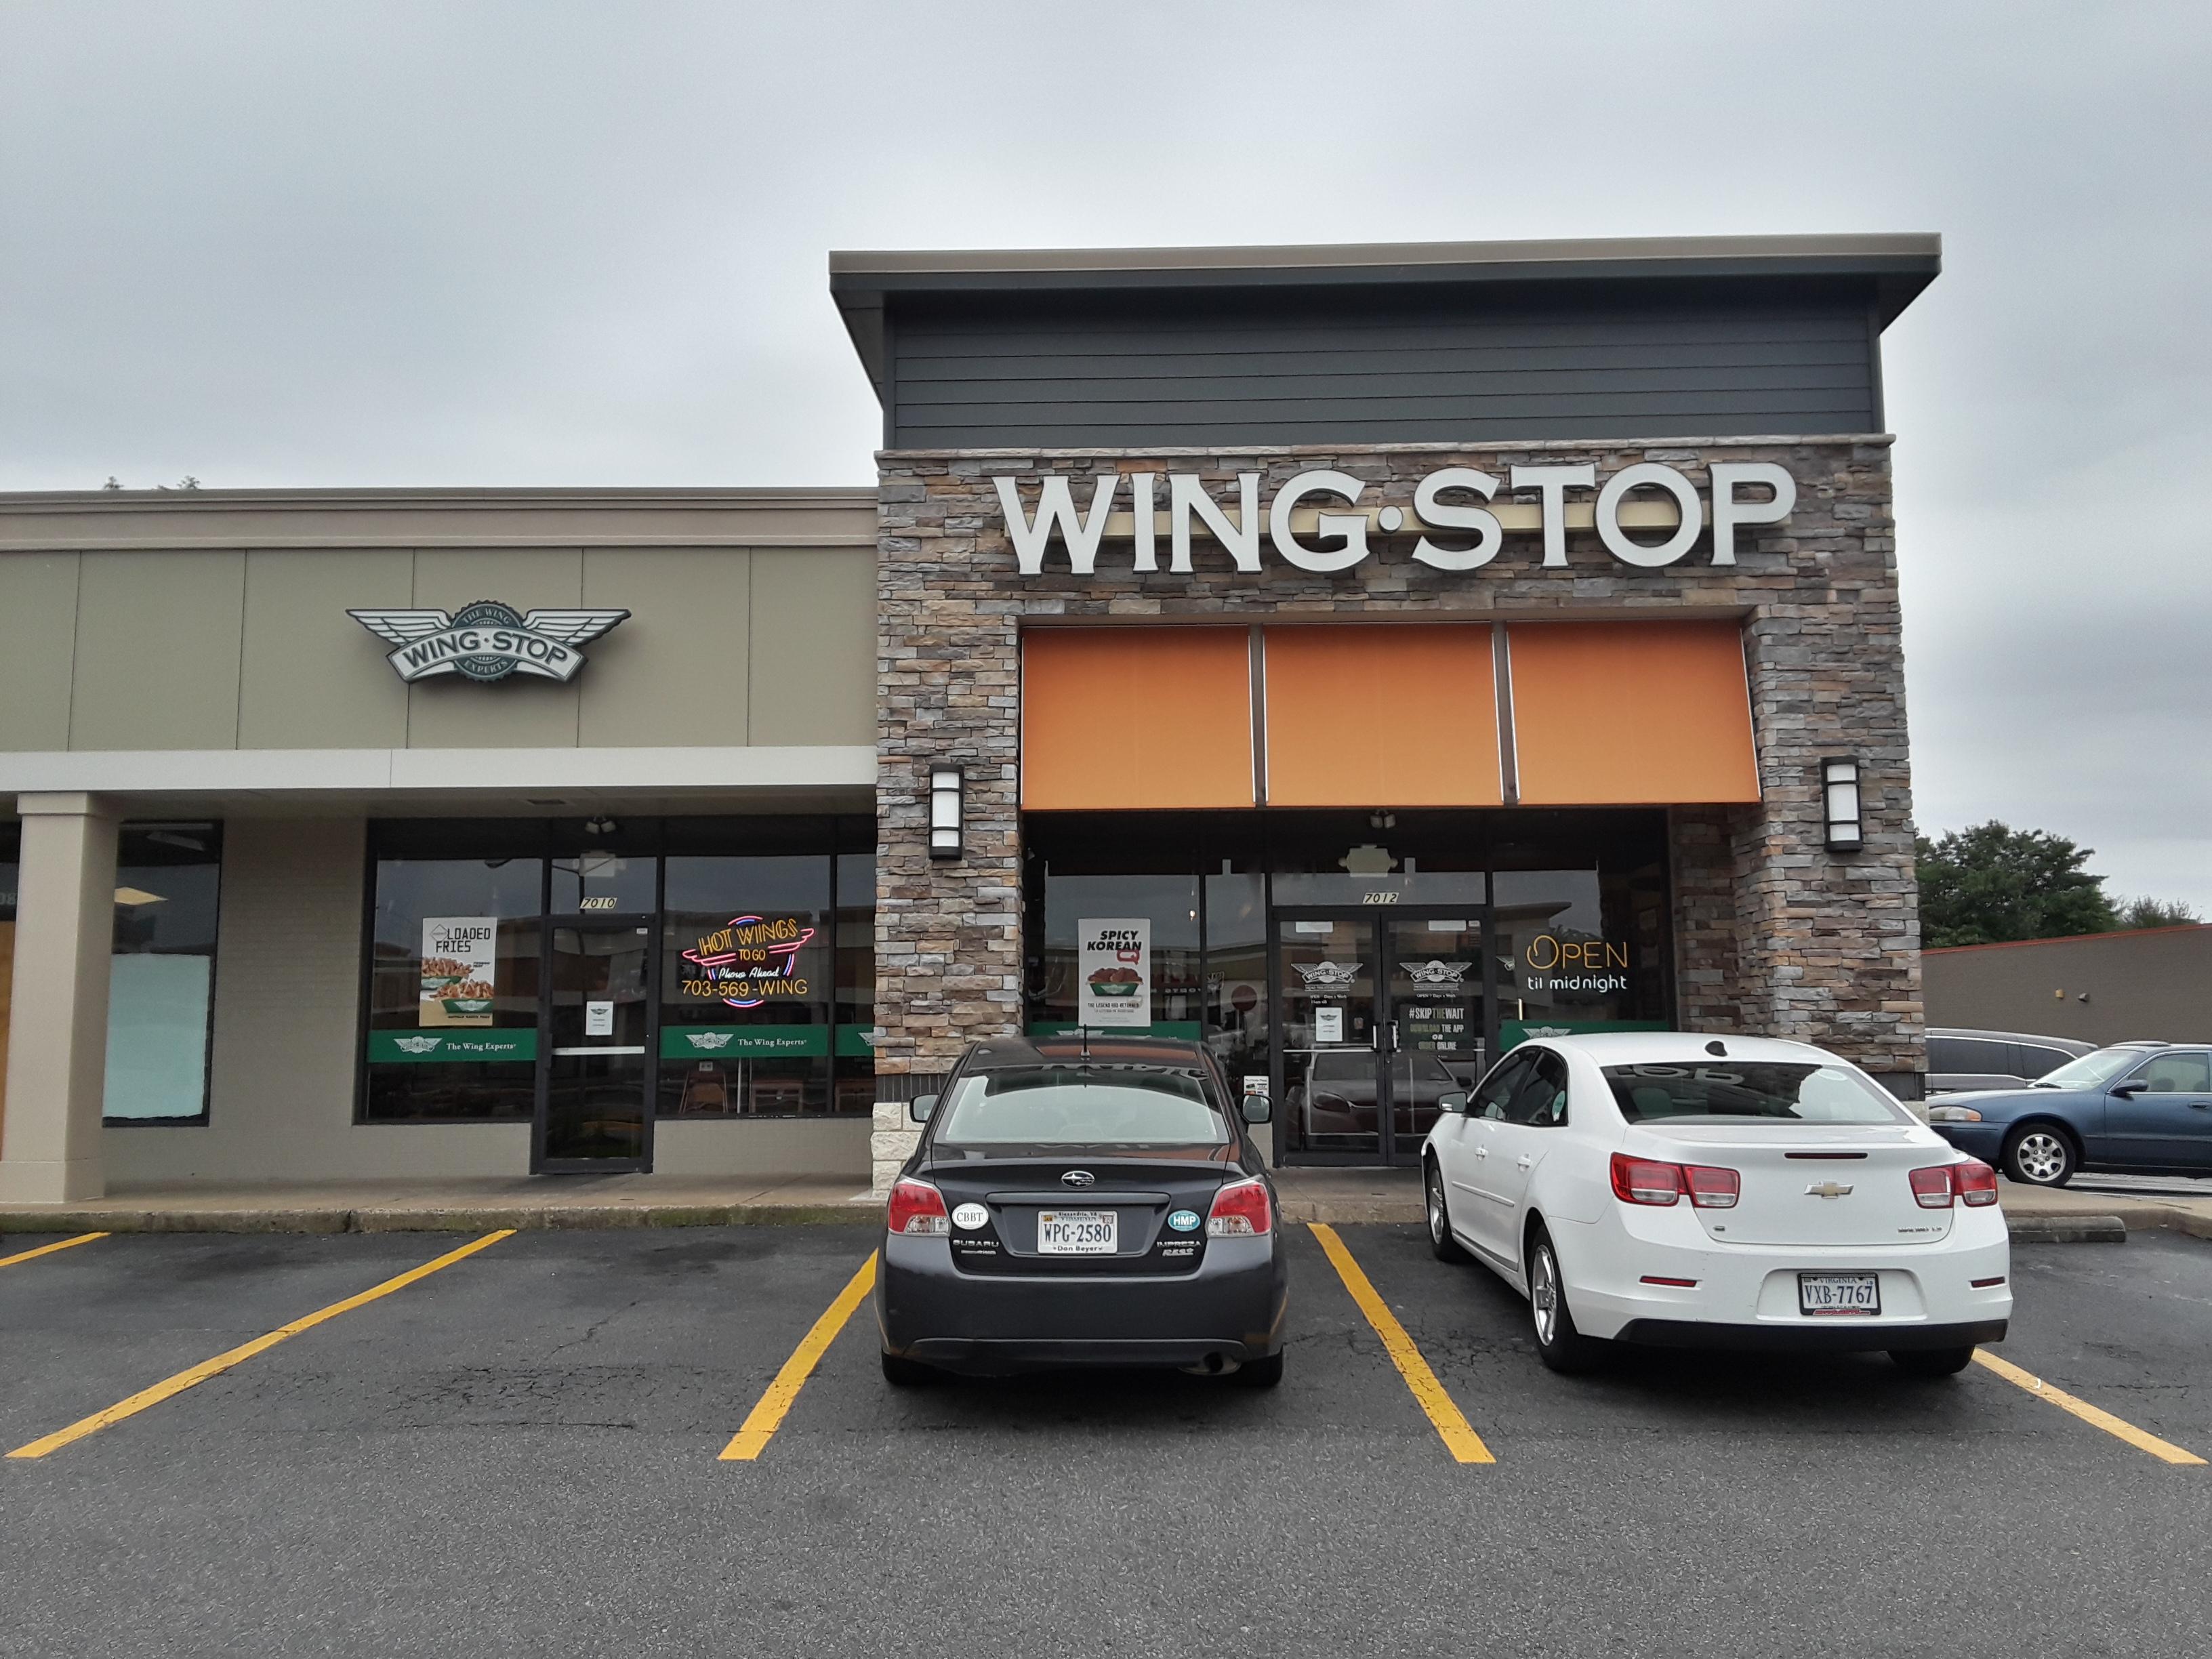 image relating to Wingstop Printable Menu named Wingstop - Wikipedia